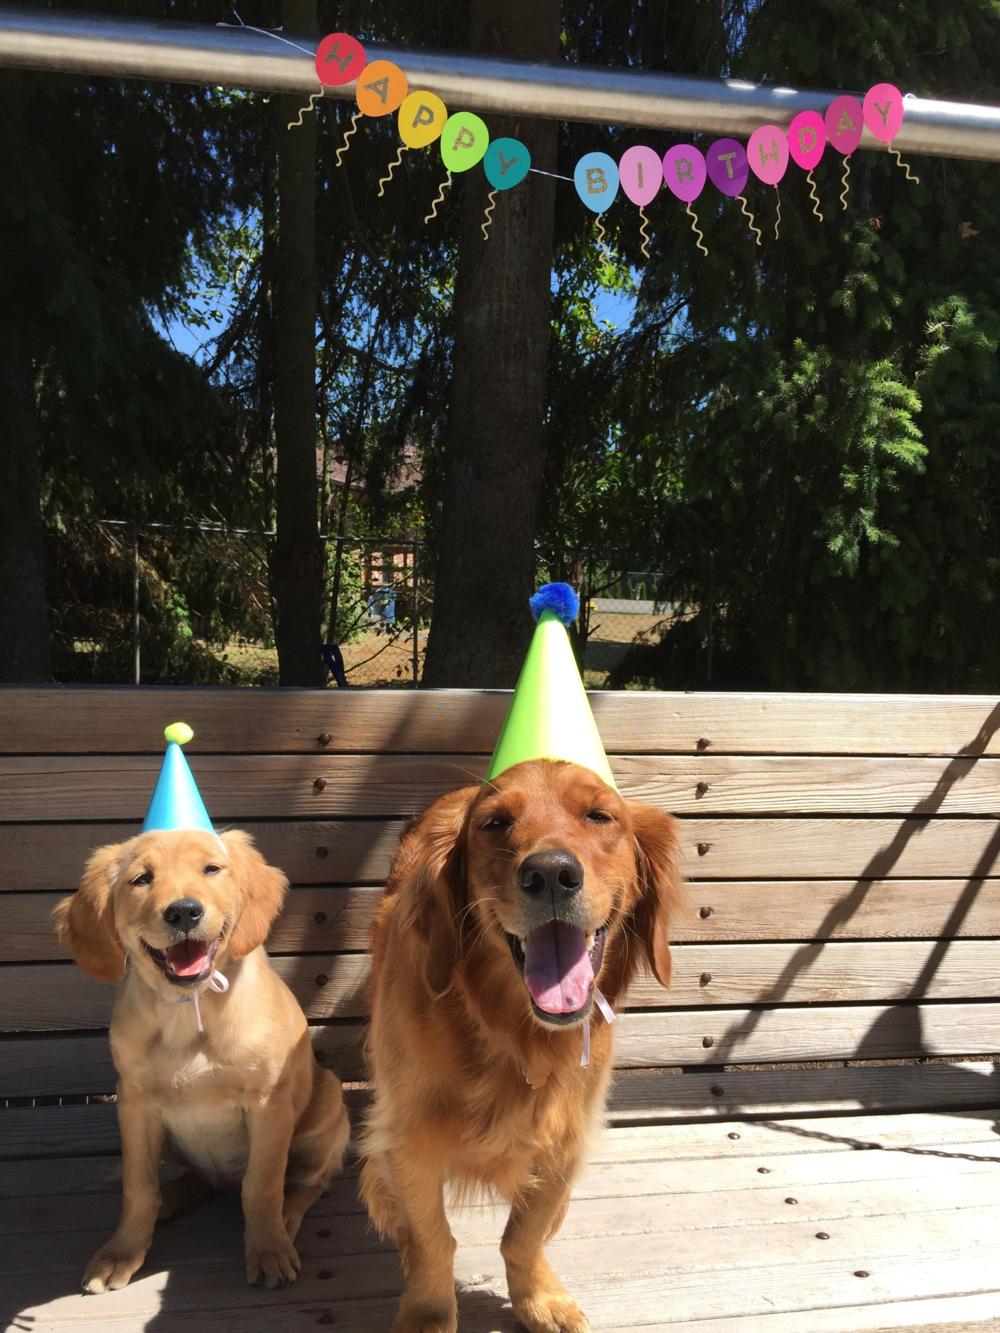 Puppy Golden Retrievers Wearing Party Hats